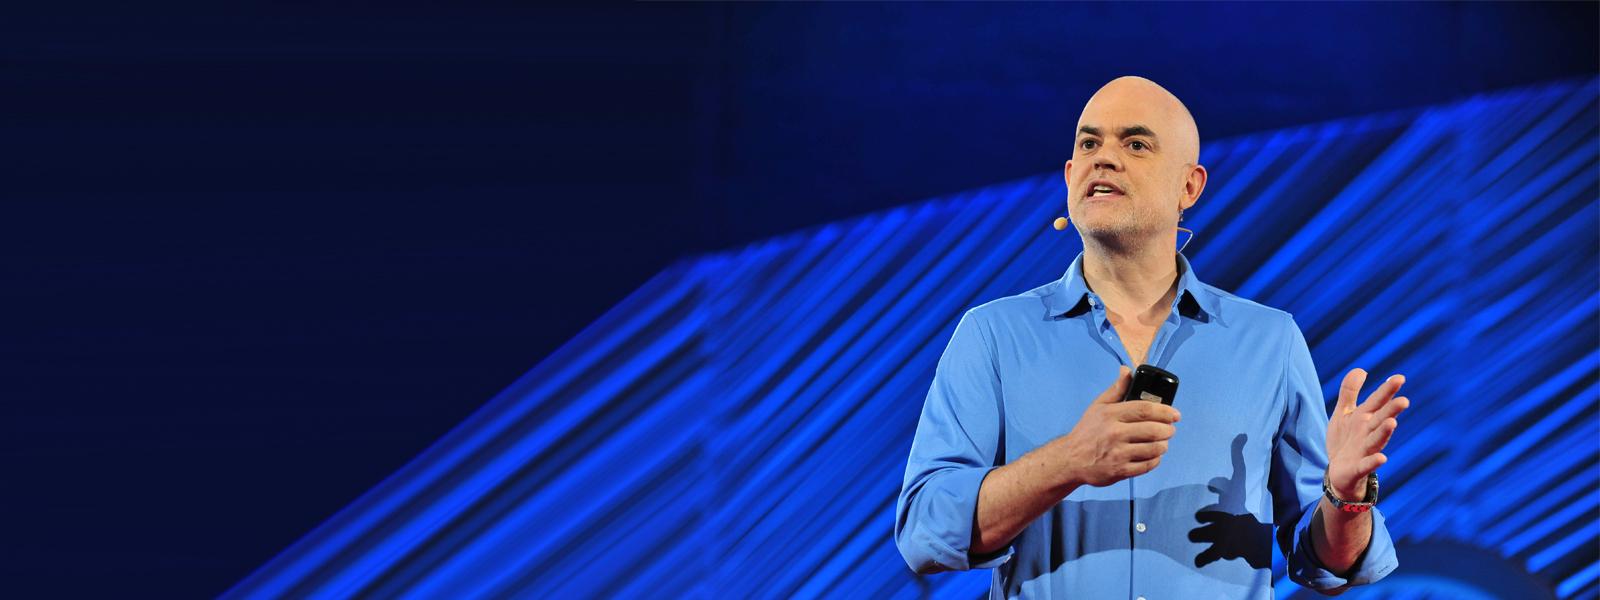 TEDMED - Talk Details - Expanding the genetic alphabet